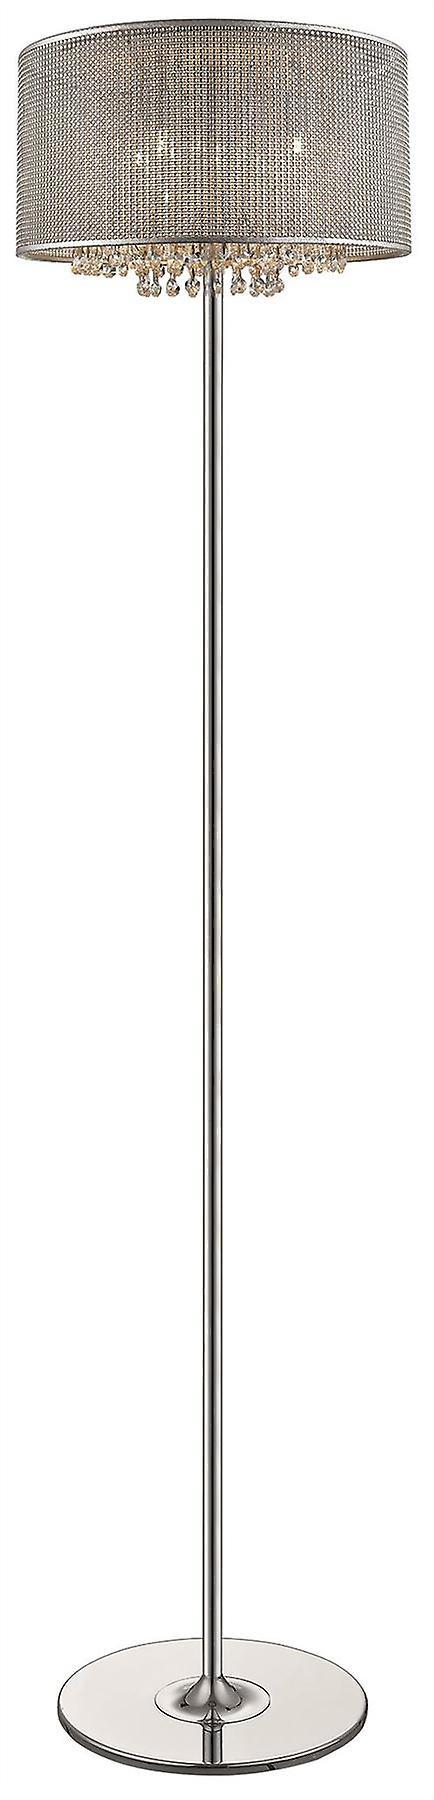 Spbague lumièreing - Brighton argent Finish Floor Lamp  DSZT037TJ4GMPM